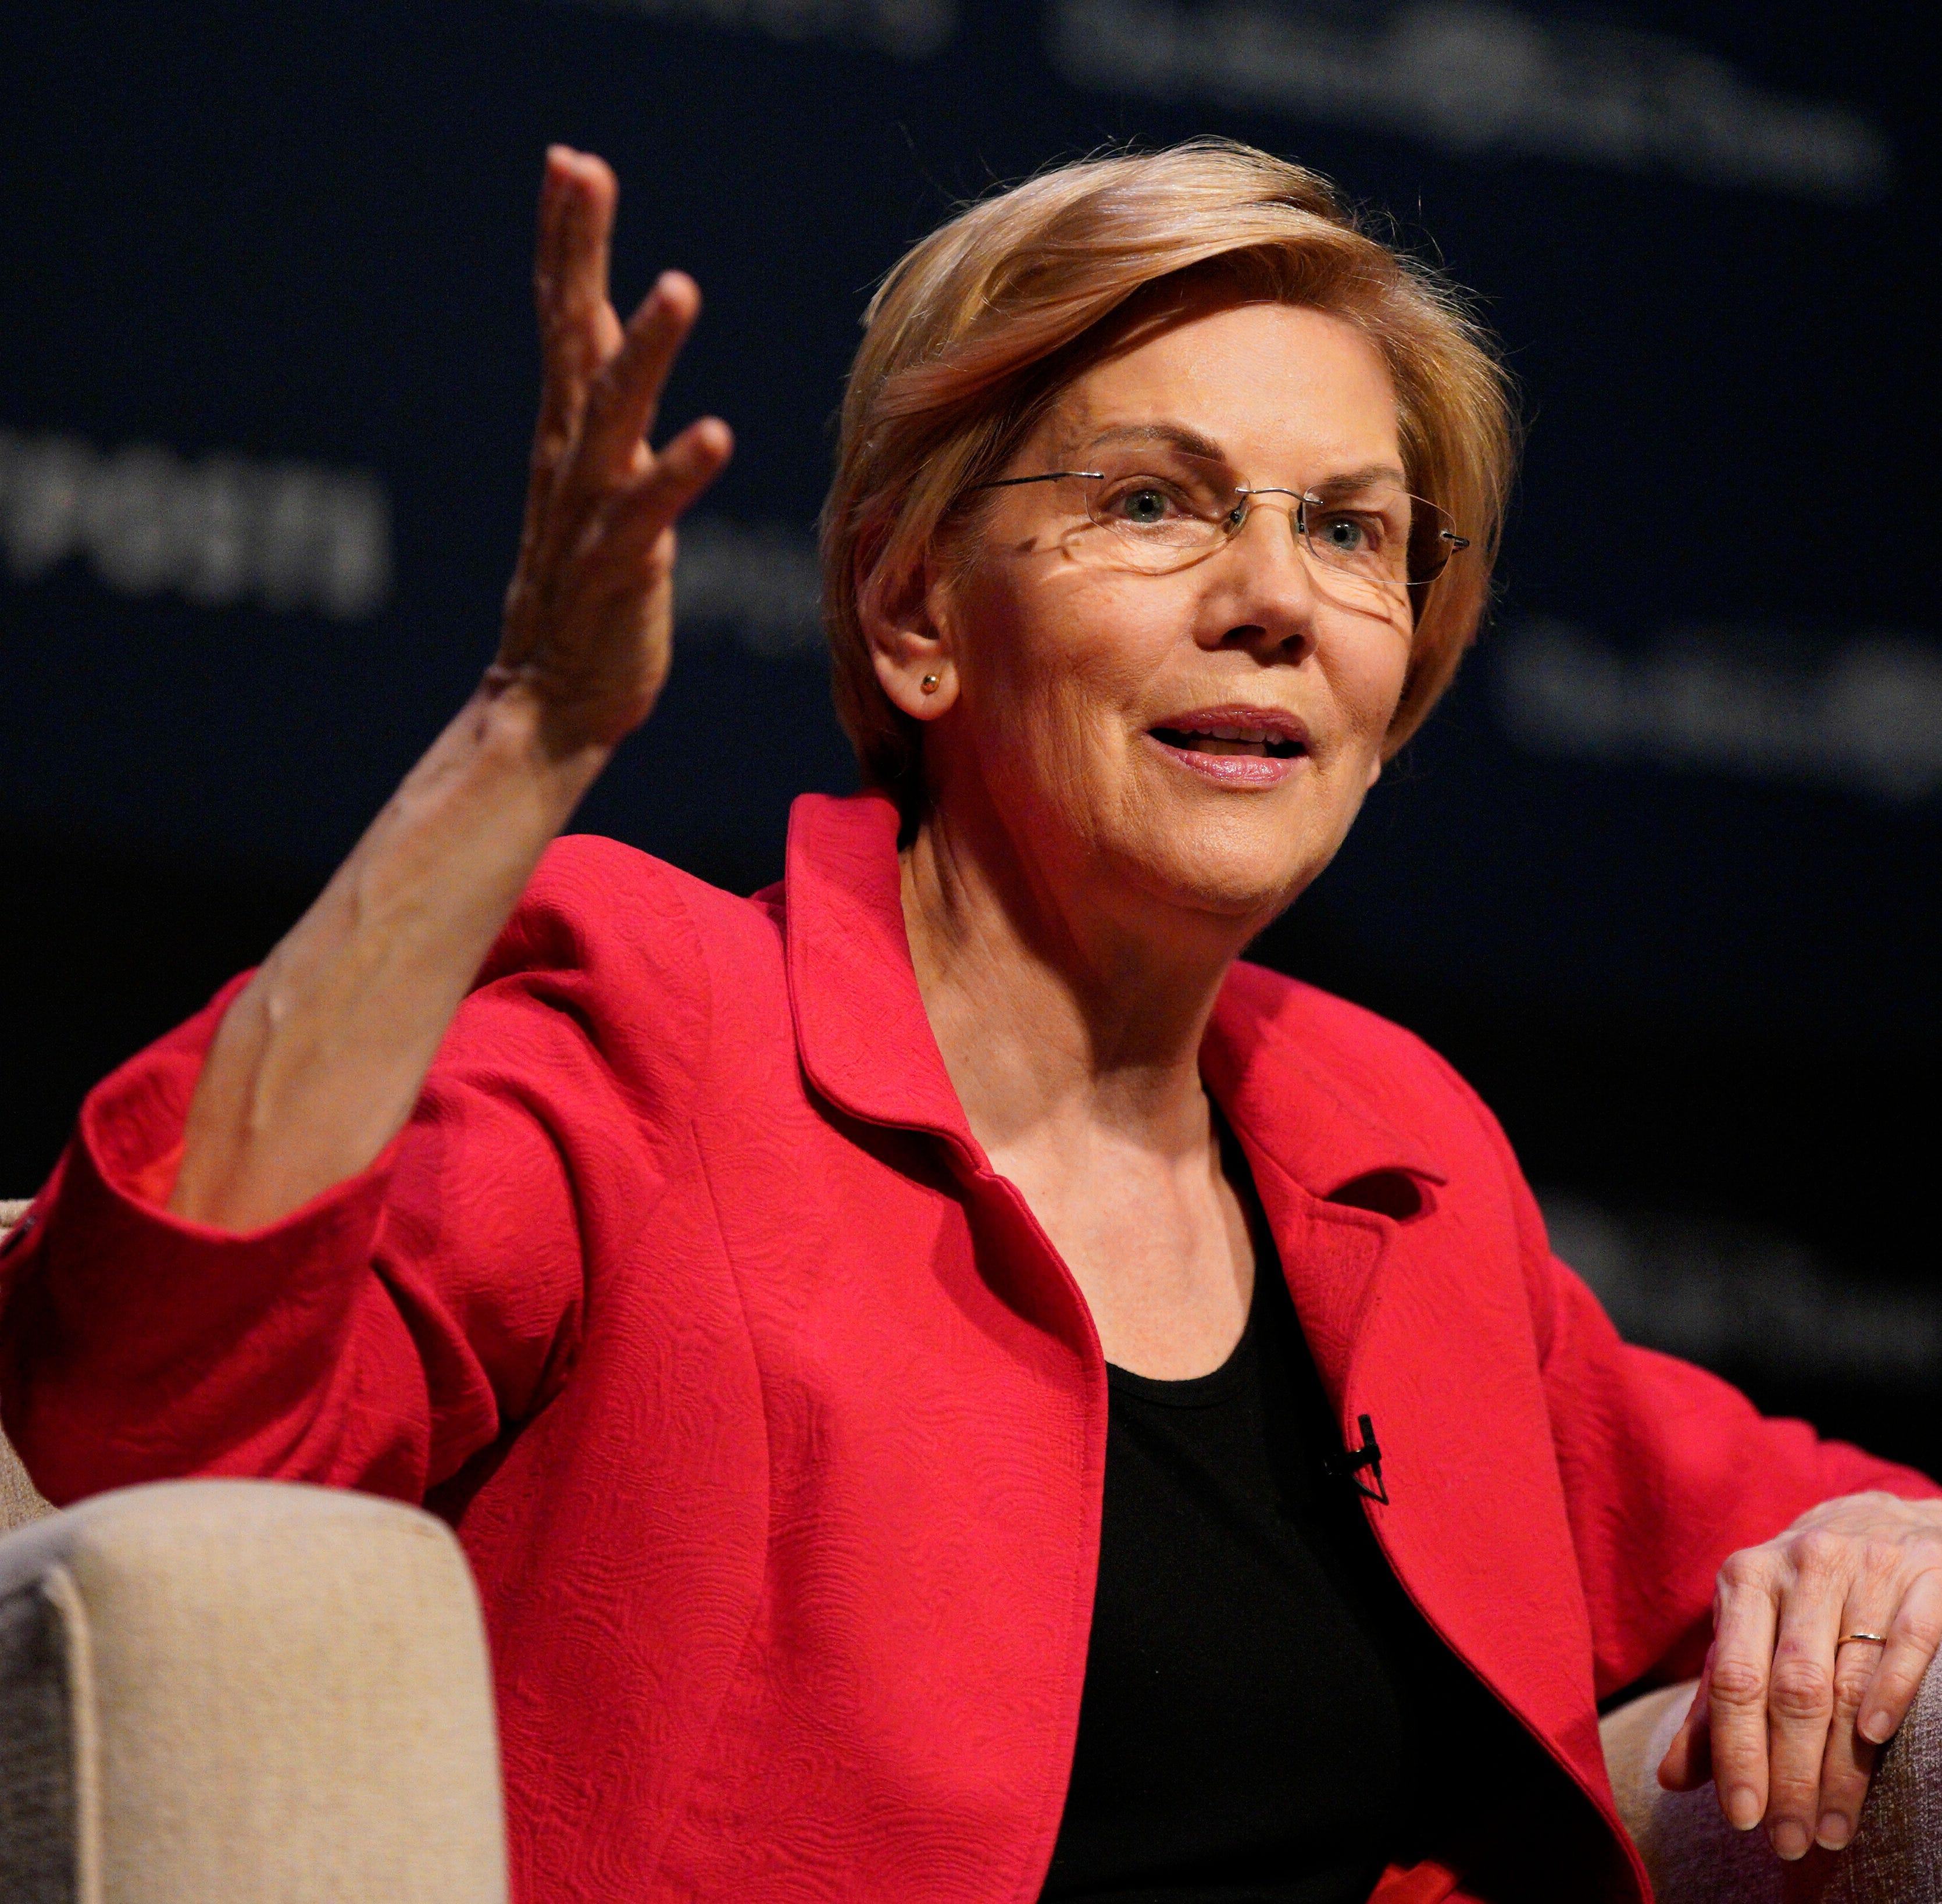 Democratic presidential contenders Warren, Klobuchar agree on breaking up Big Ag